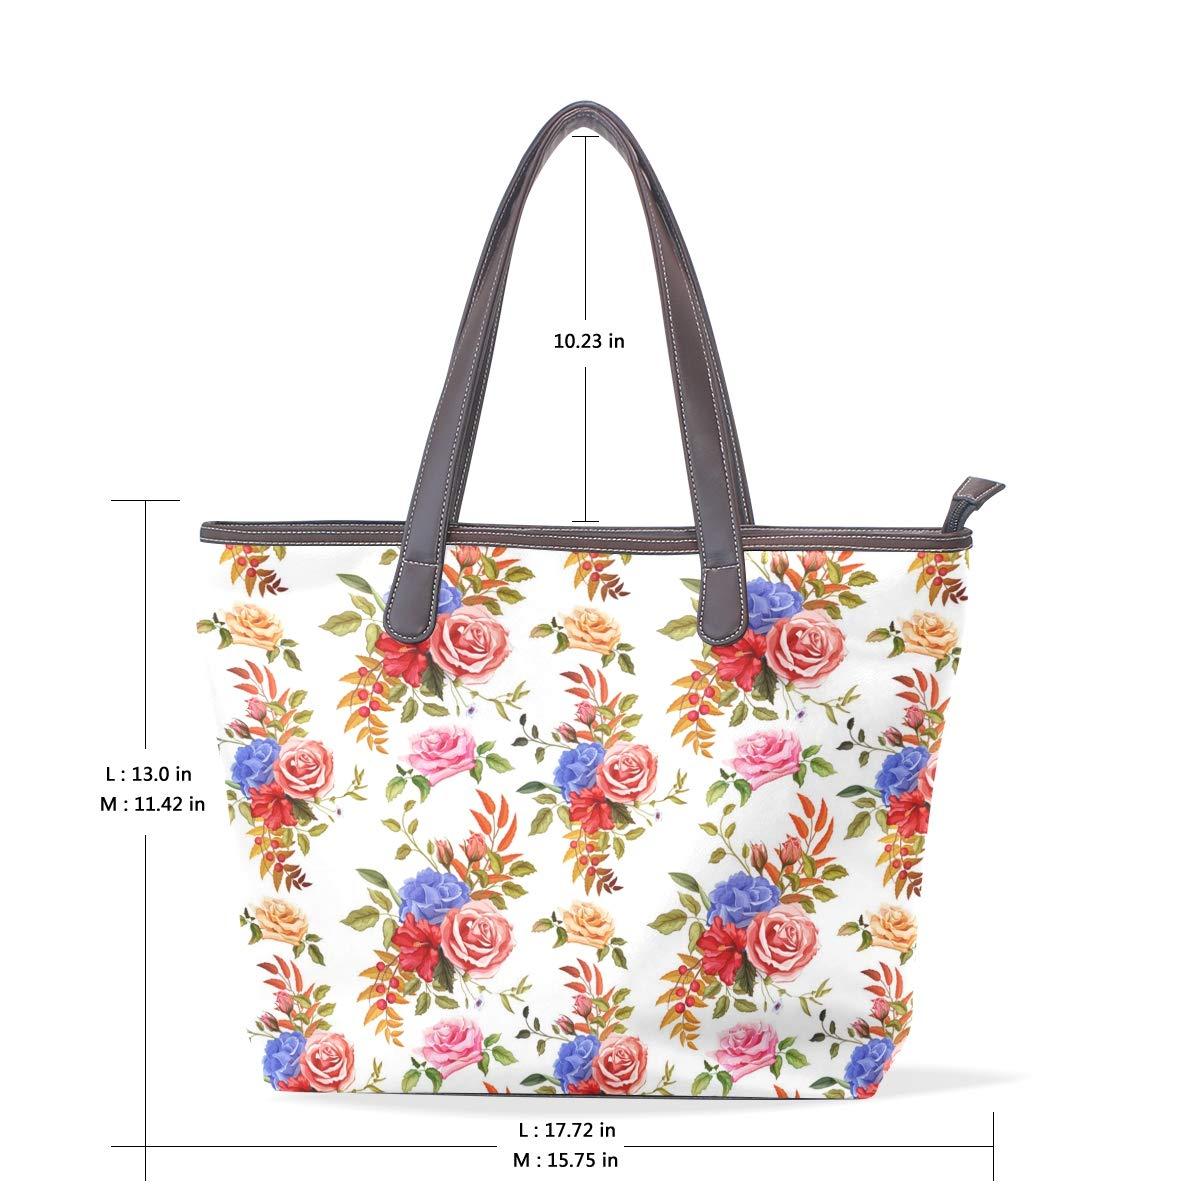 Womens Leather Flower Hibiscus Rose Handbag Satchel Tote Bag Tote Purse